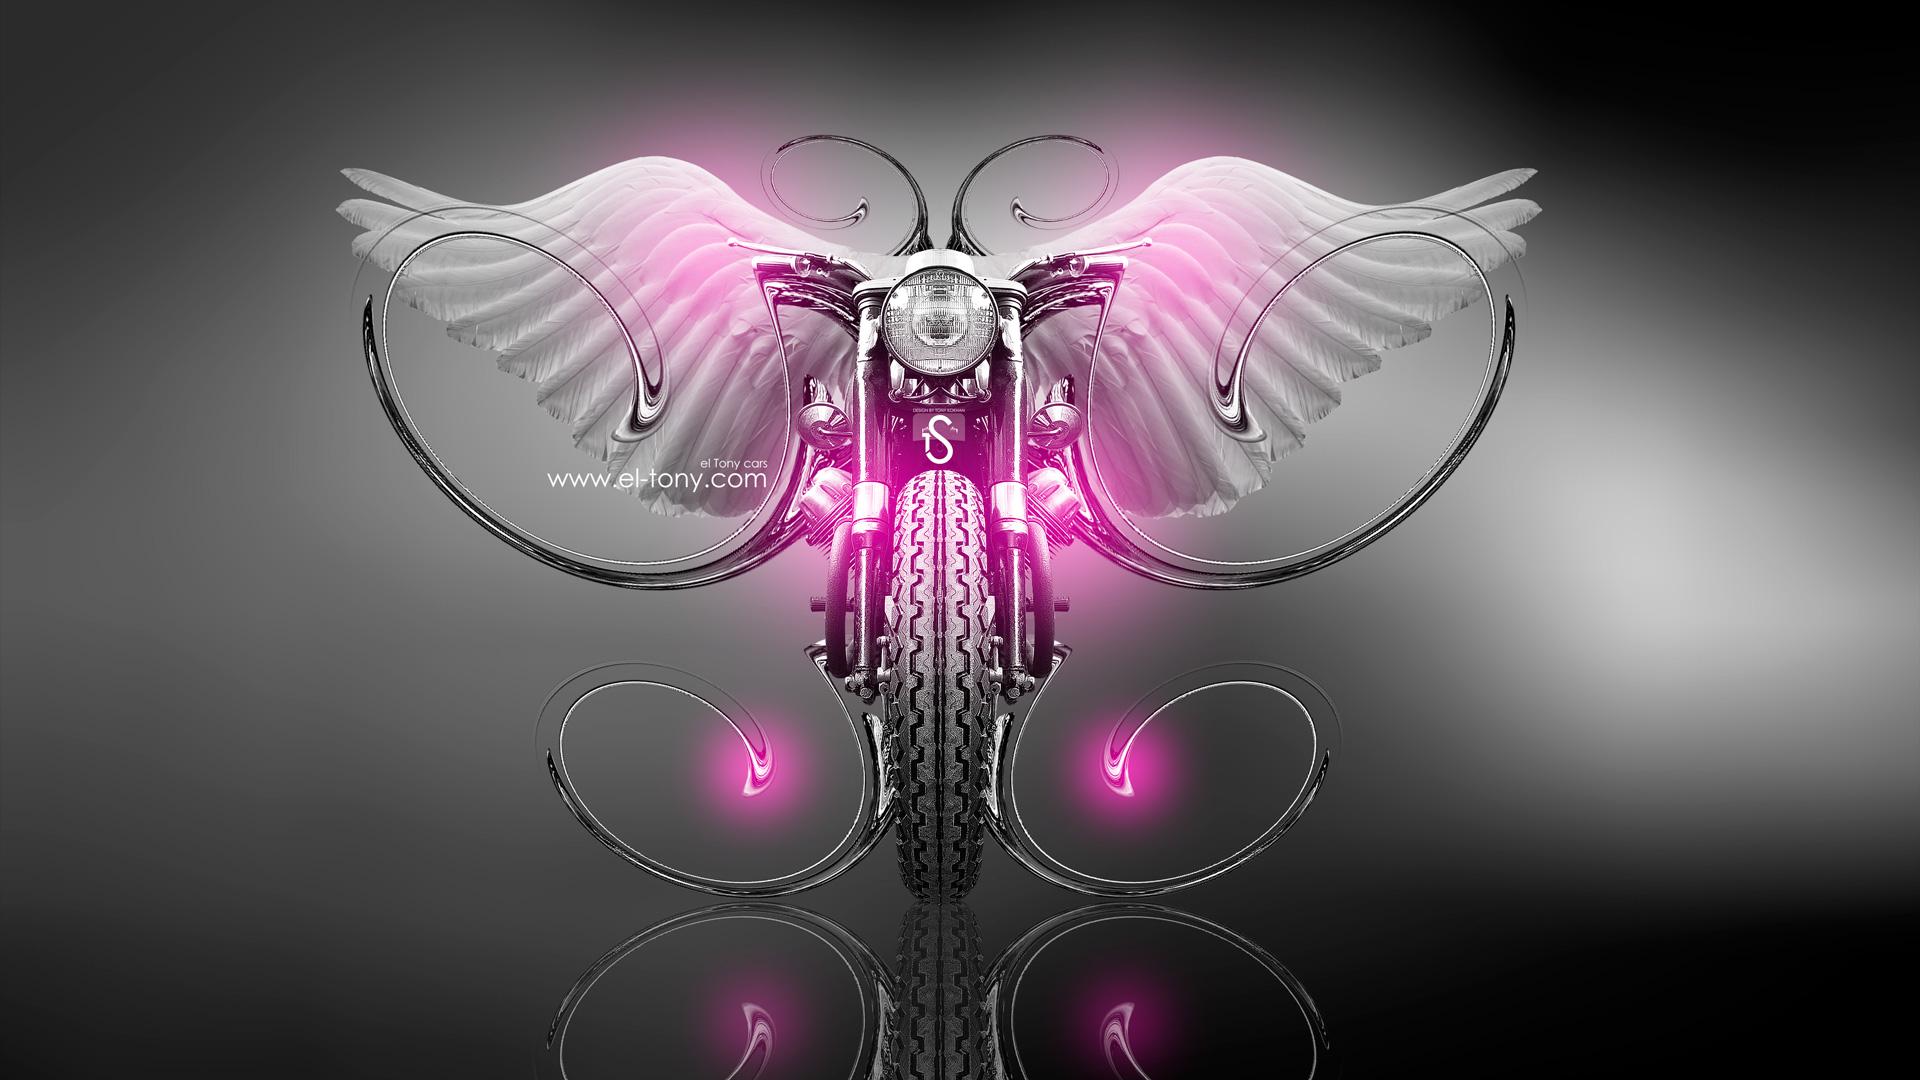 Moto Guzzi Fantasy Fly 2013 Pink Neon HD Wallpapers By Tony Kokhan ...